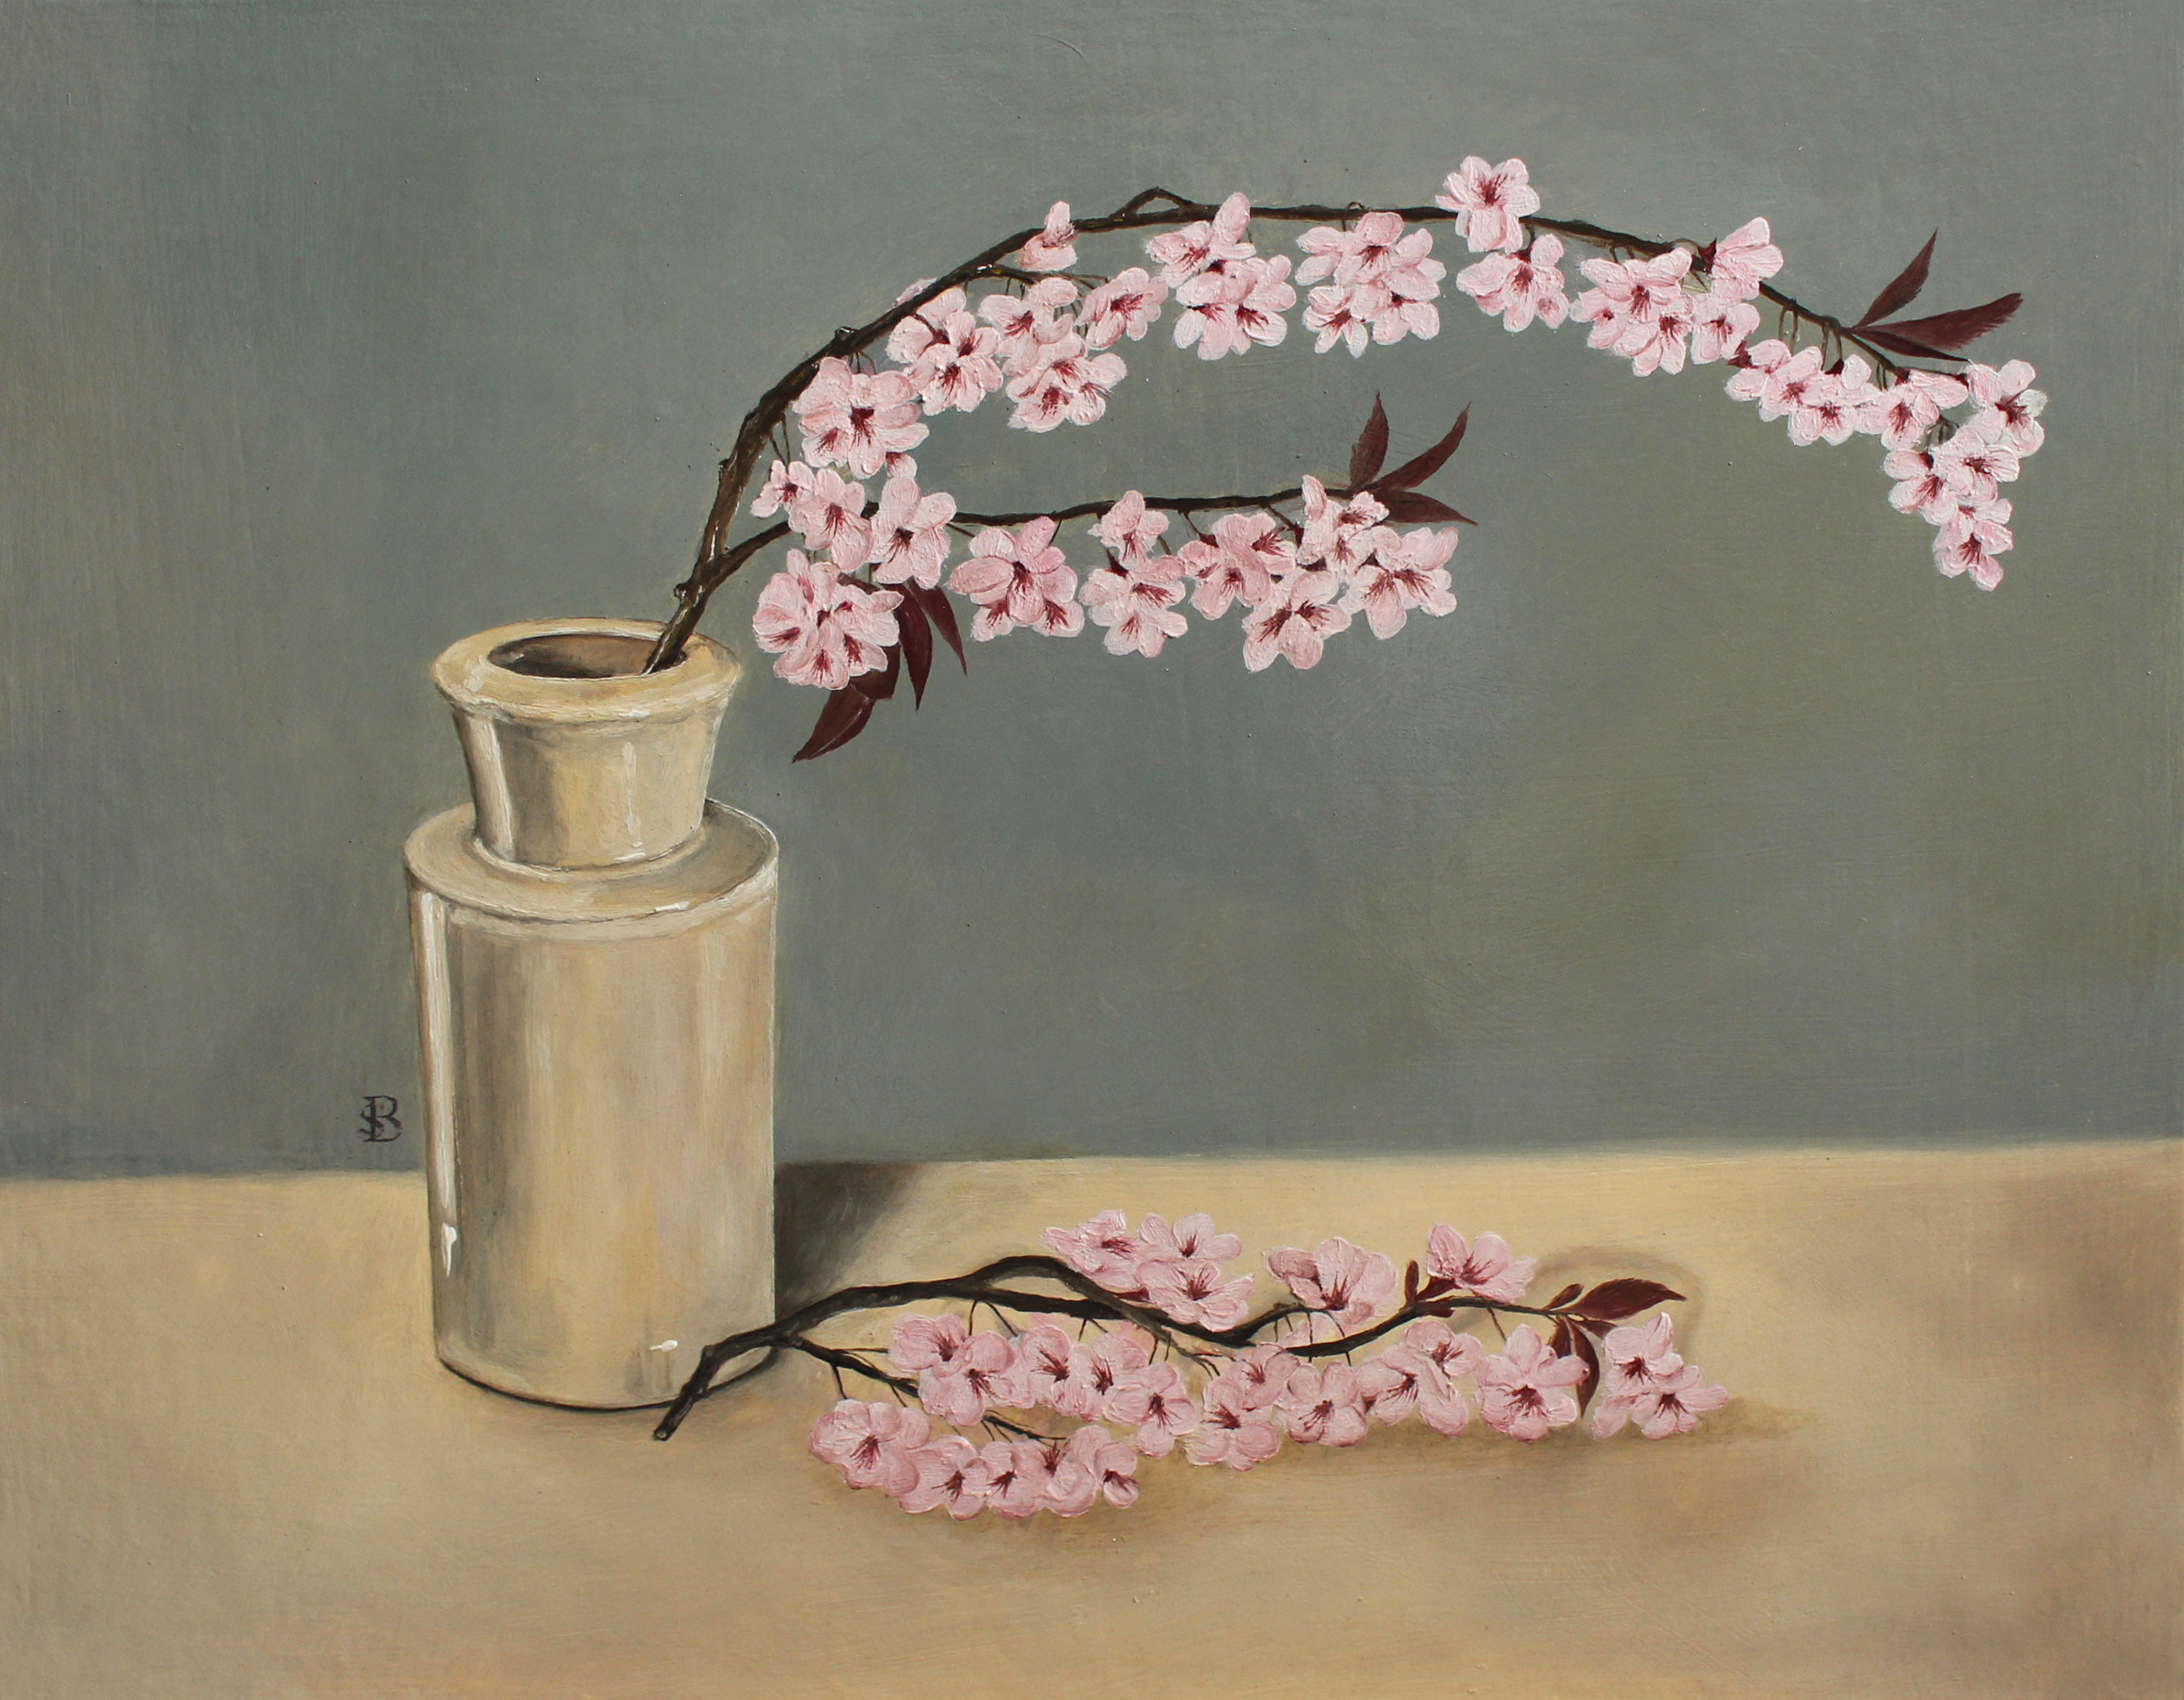 Blossom in Earthware Jar